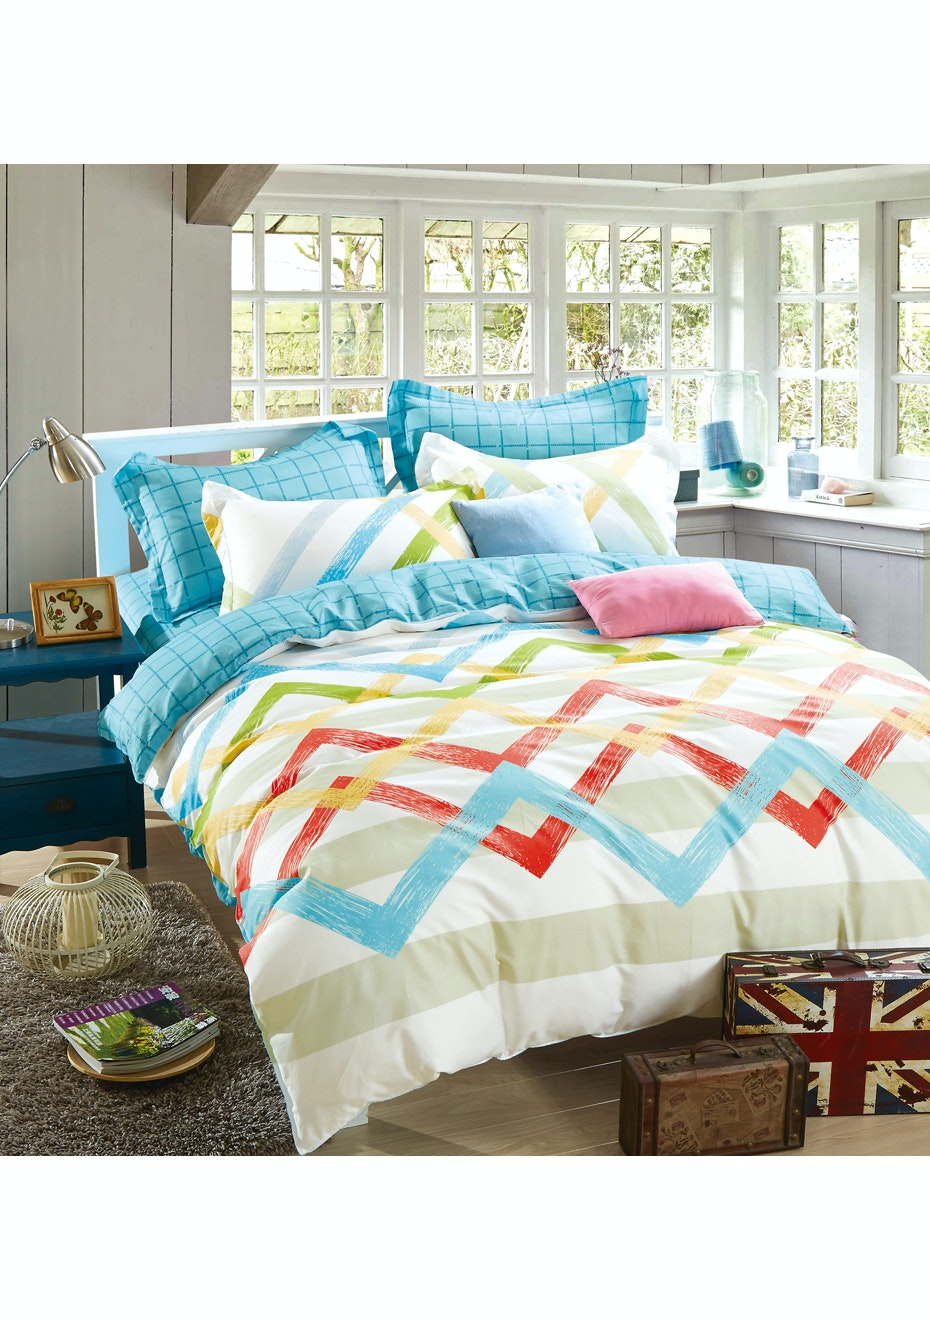 Skylar Quilt Cover Set - Reversible Design - 100% Cotton Double Bed